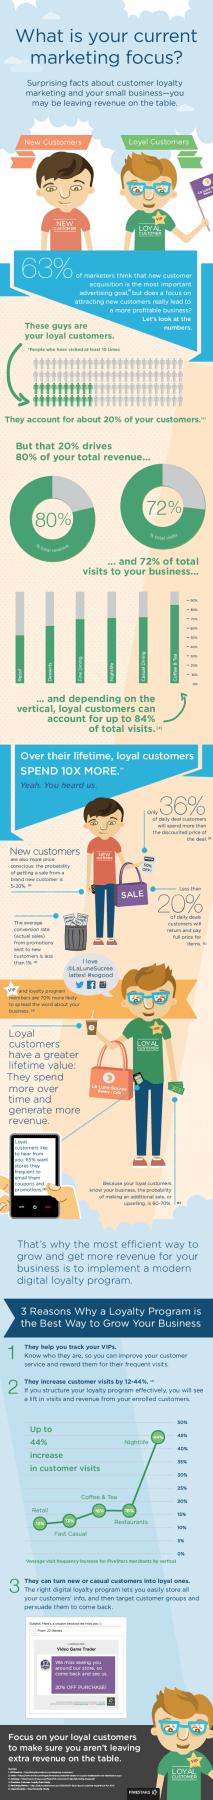 Infiografik: Loyalty Programme und Stammkunden im E-Commerce